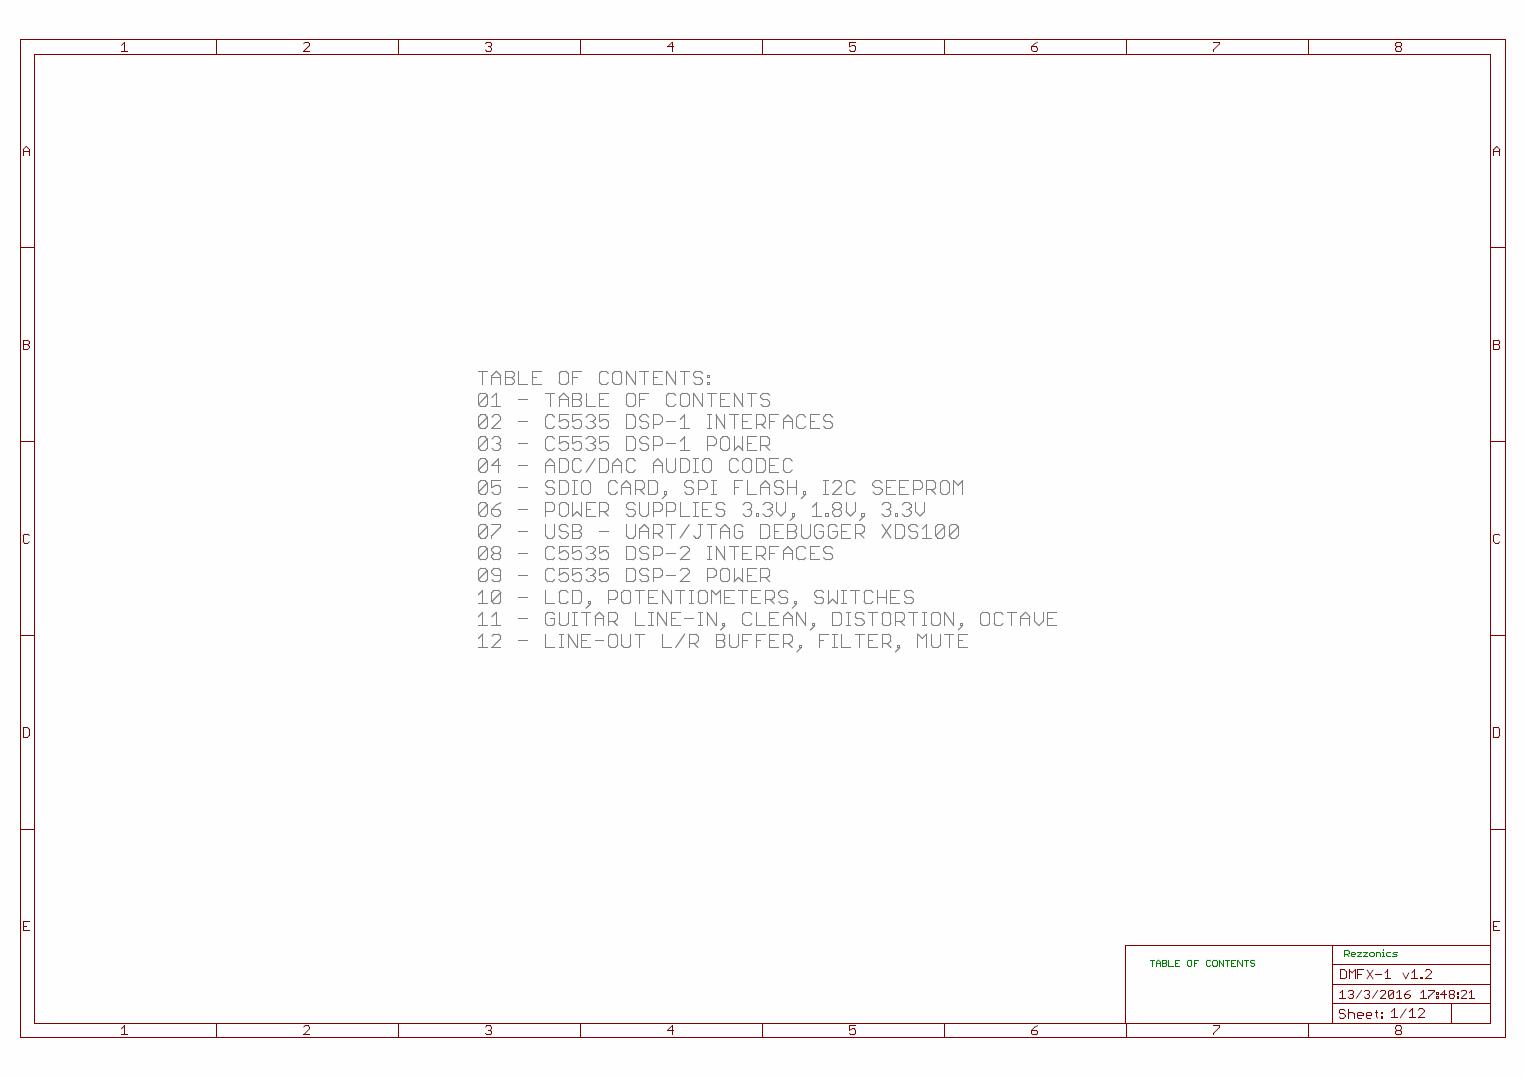 Rezzonics Dmfx 1 1 Main Board Schematics And Bom